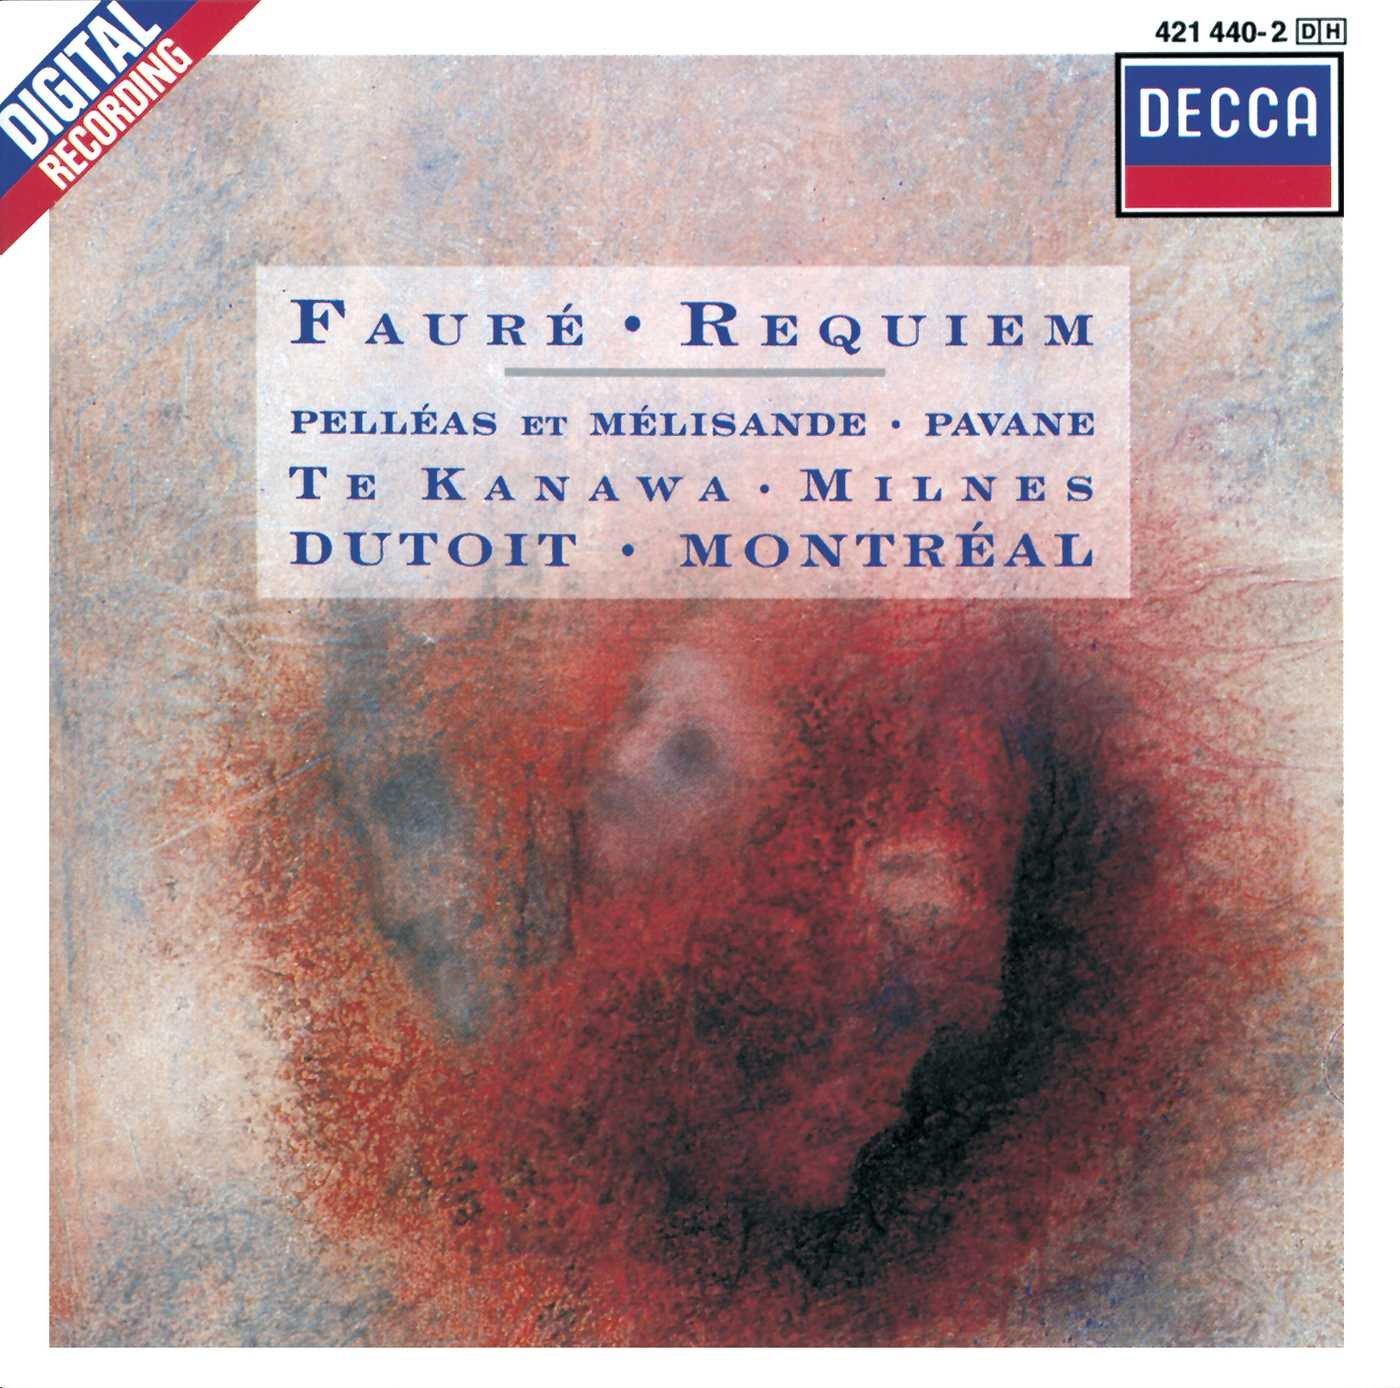 Faure: Requiem/Pelleas Et Melisande/Pavane by DECCA,PRIMO NOVECENTO,,MUSICA SACRA,